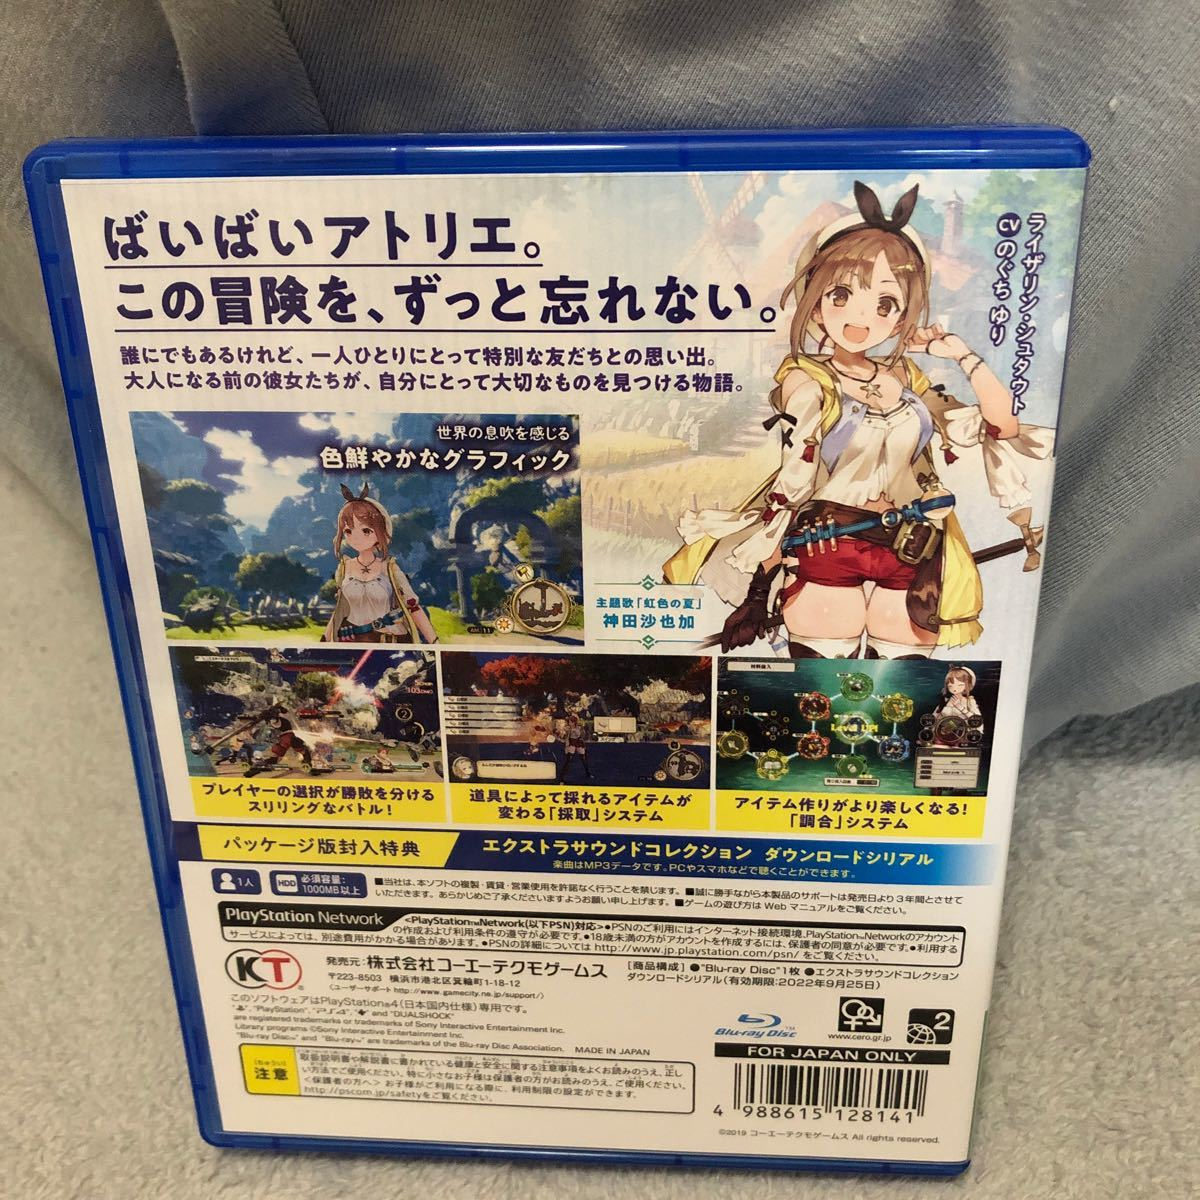 【PS4】 ライザのアトリエ 常闇の女王と秘密の隠れ家 [通常版]